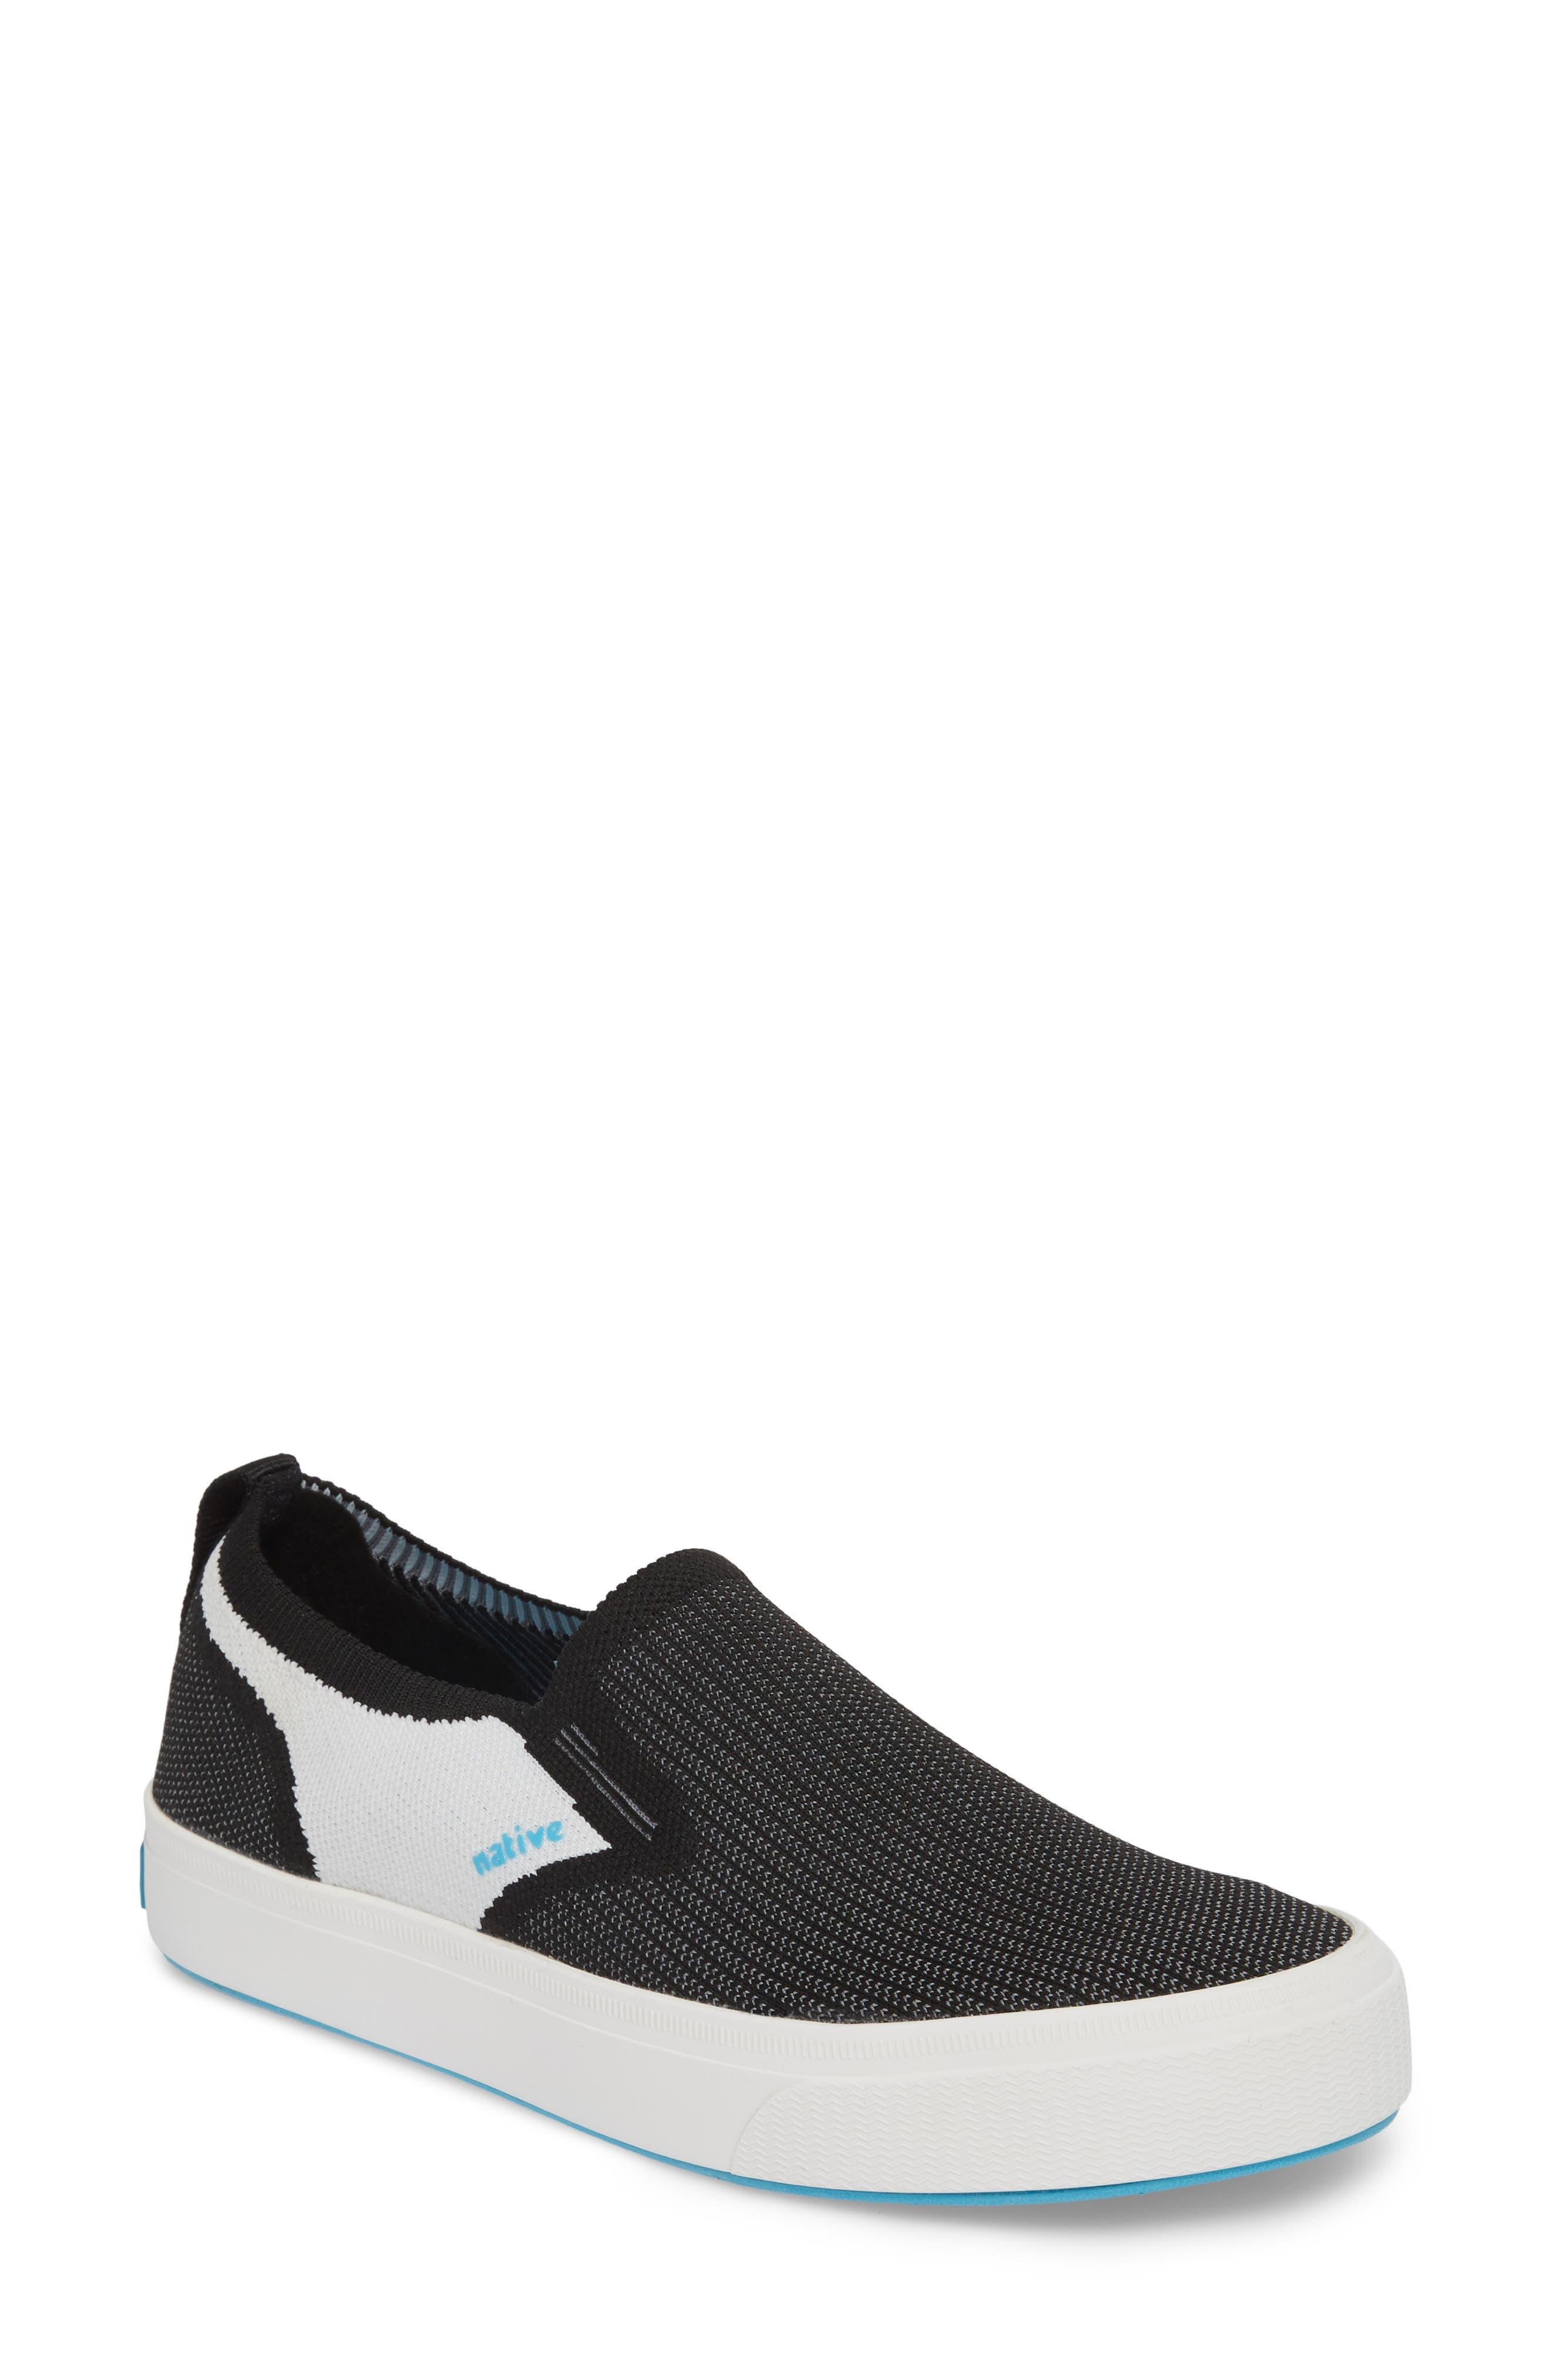 Miles Liteknit Slip-On Sneaker,                             Main thumbnail 1, color,                             JIFFY BLACK/ SHELL WHITE